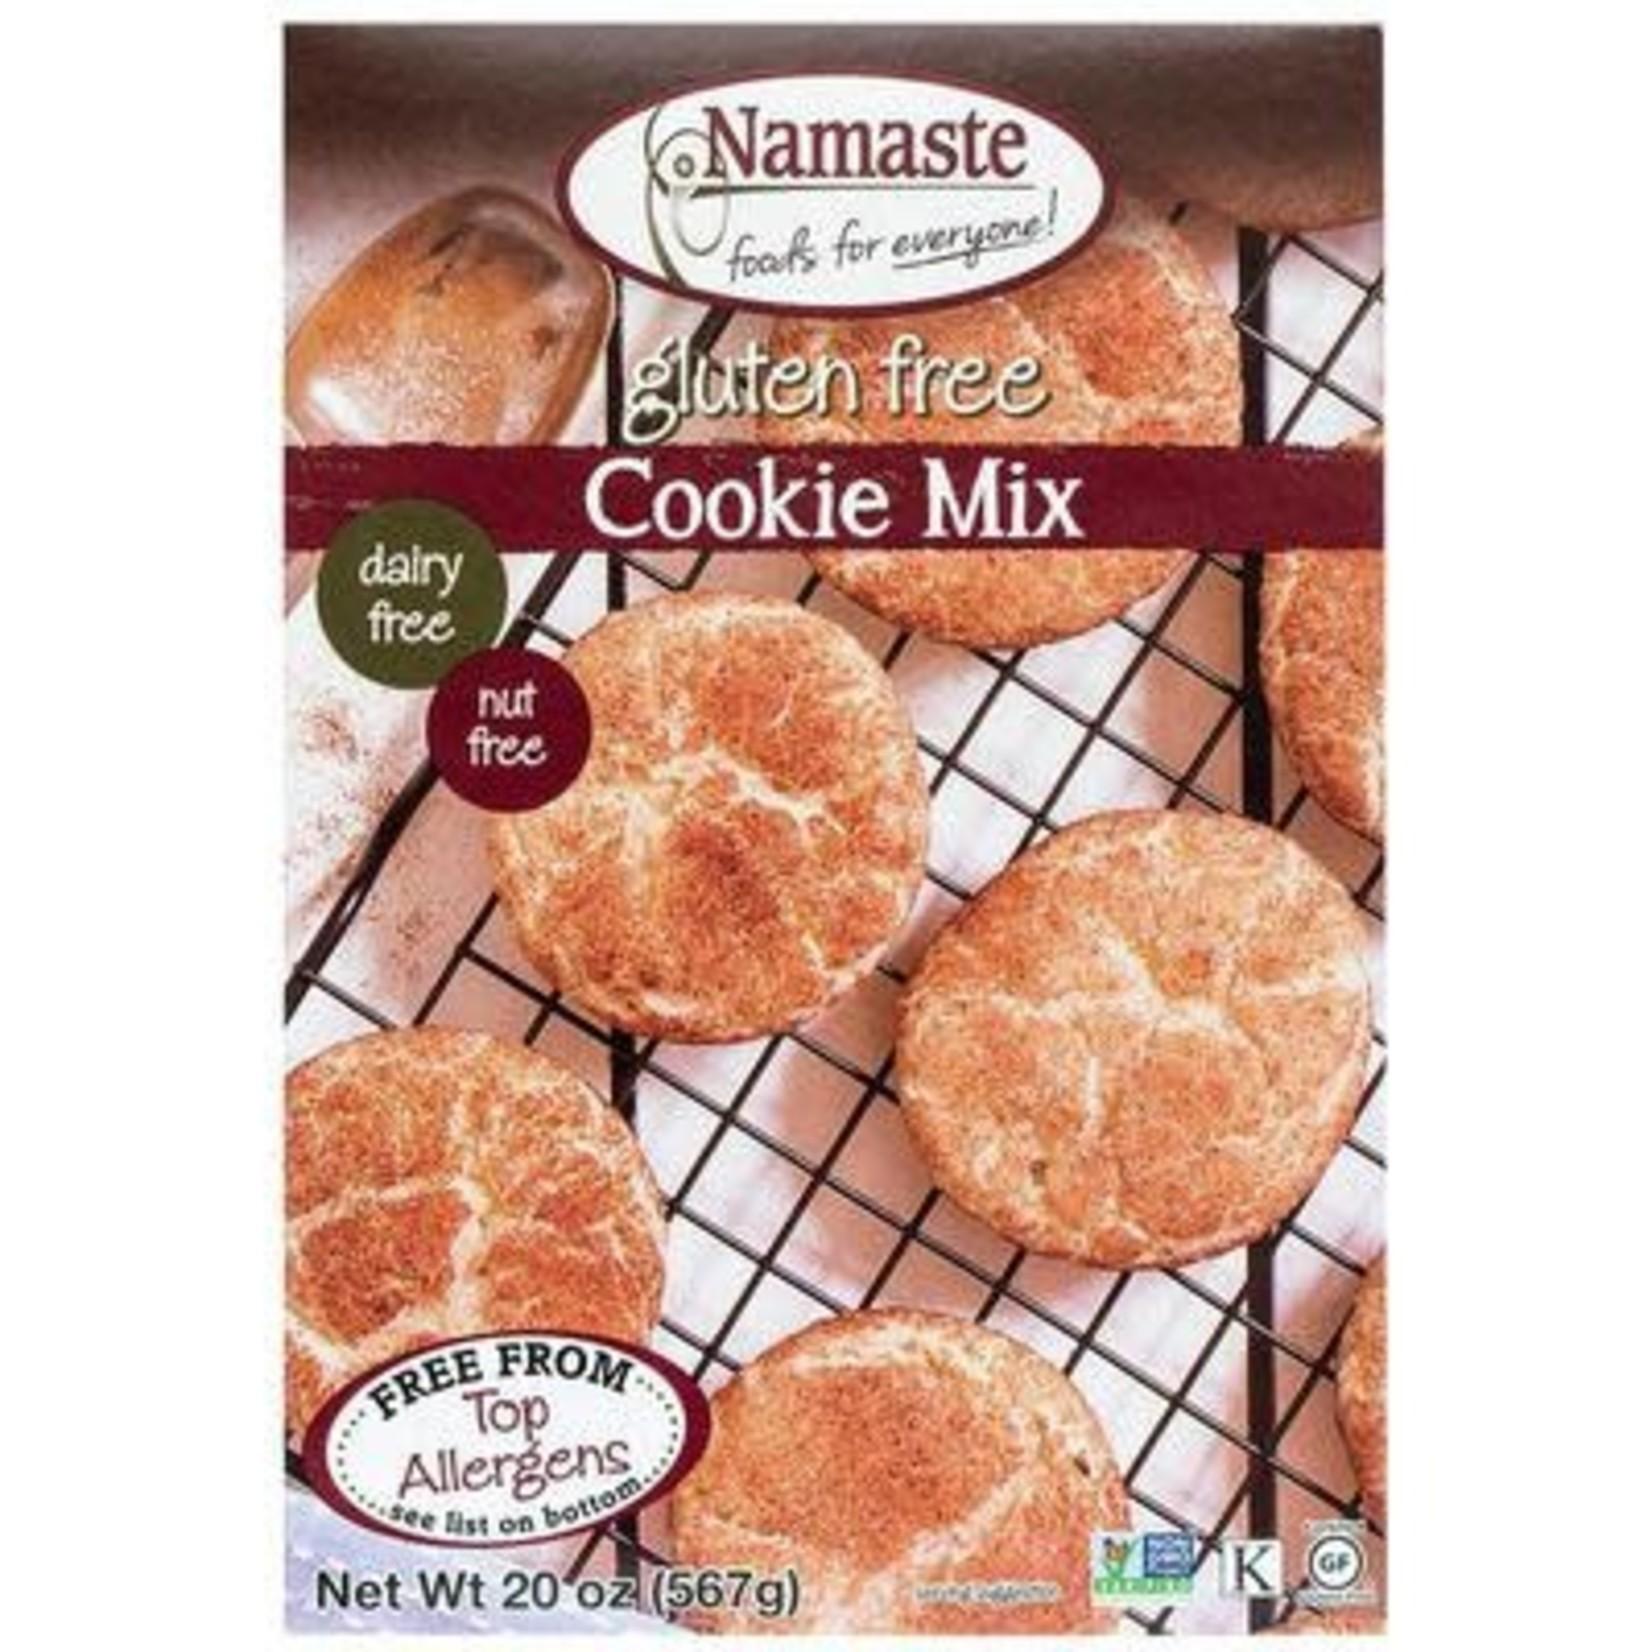 Namaste Namaste Gluten Free Cookie Mix